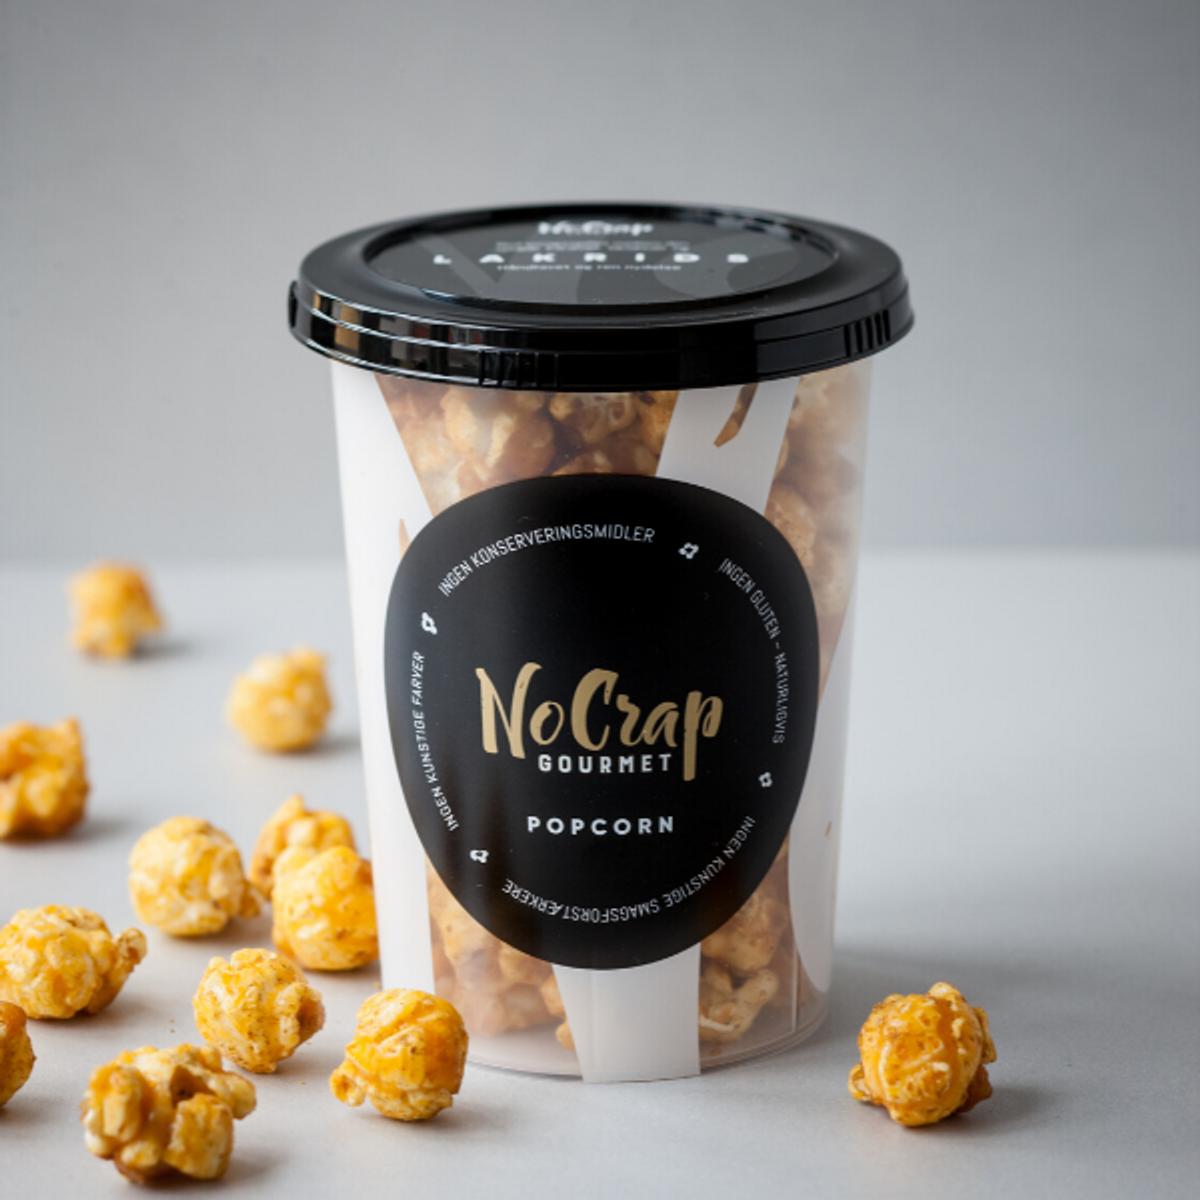 NoCrap - Gourmet Popcorn Cheddar Jalapeno 40g